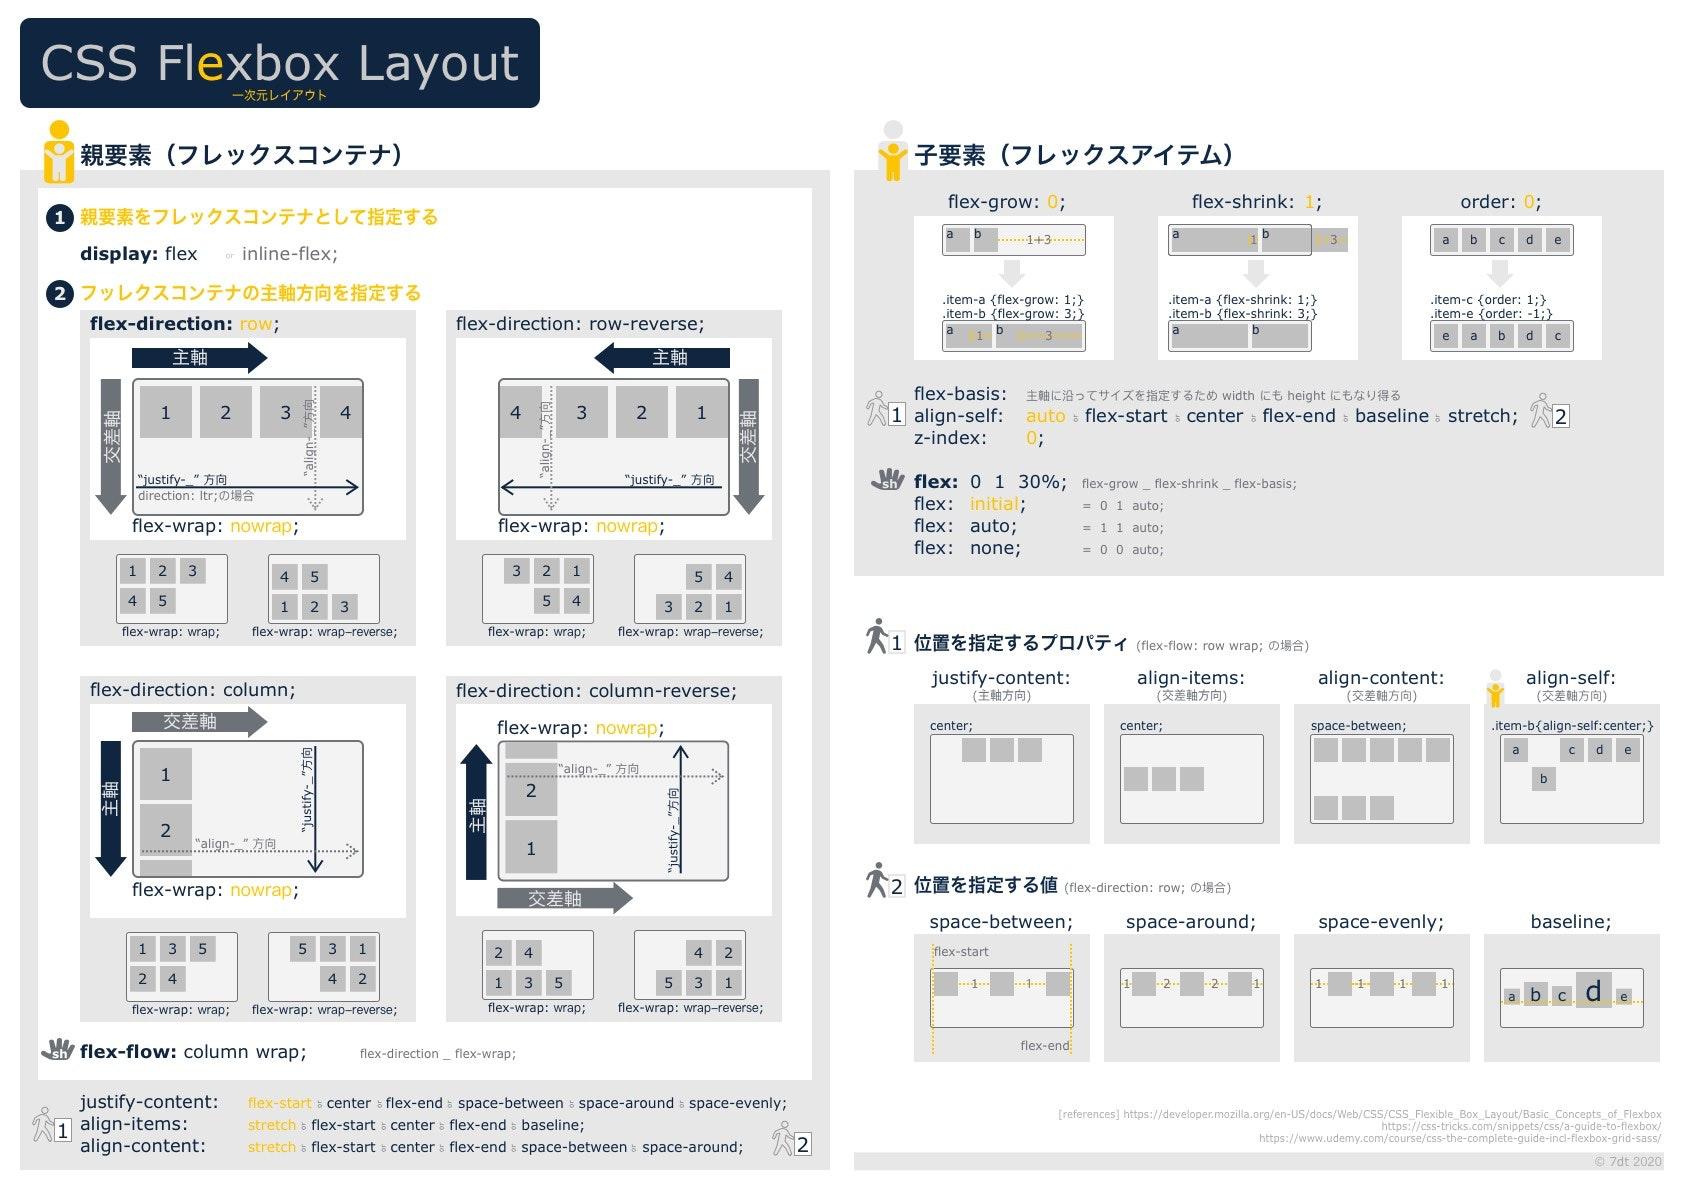 flexbox cheat sheet japanese.jpg